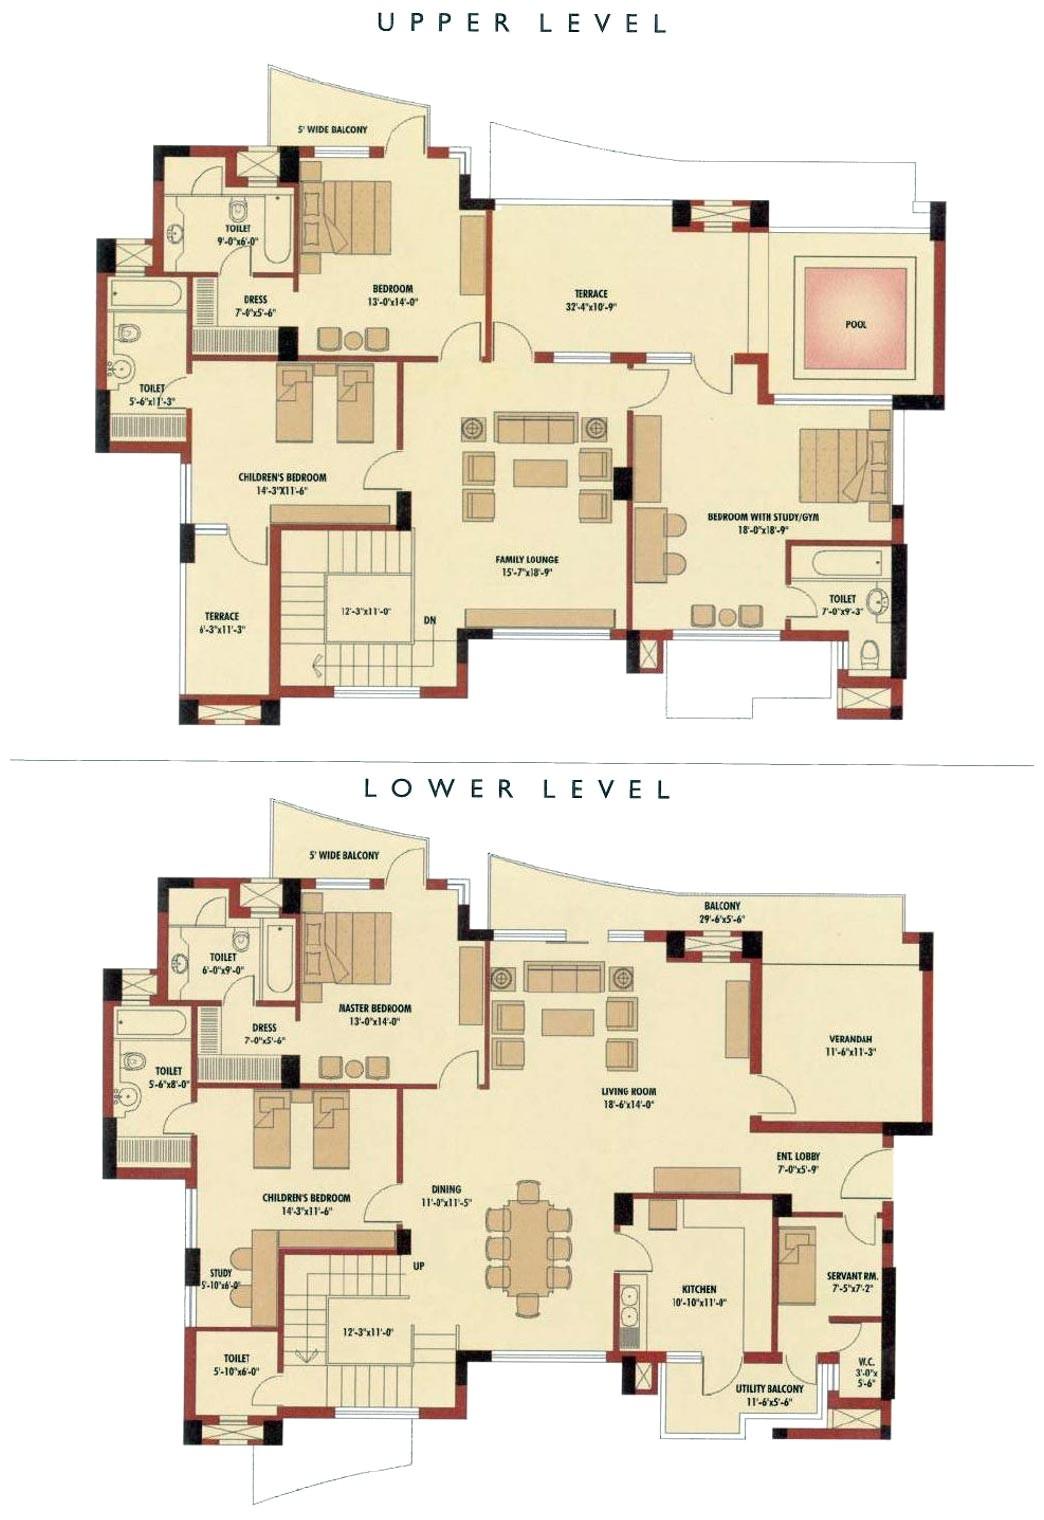 duplex house floor plans indian style fresh house plan 4 bedroom duplex house plans india